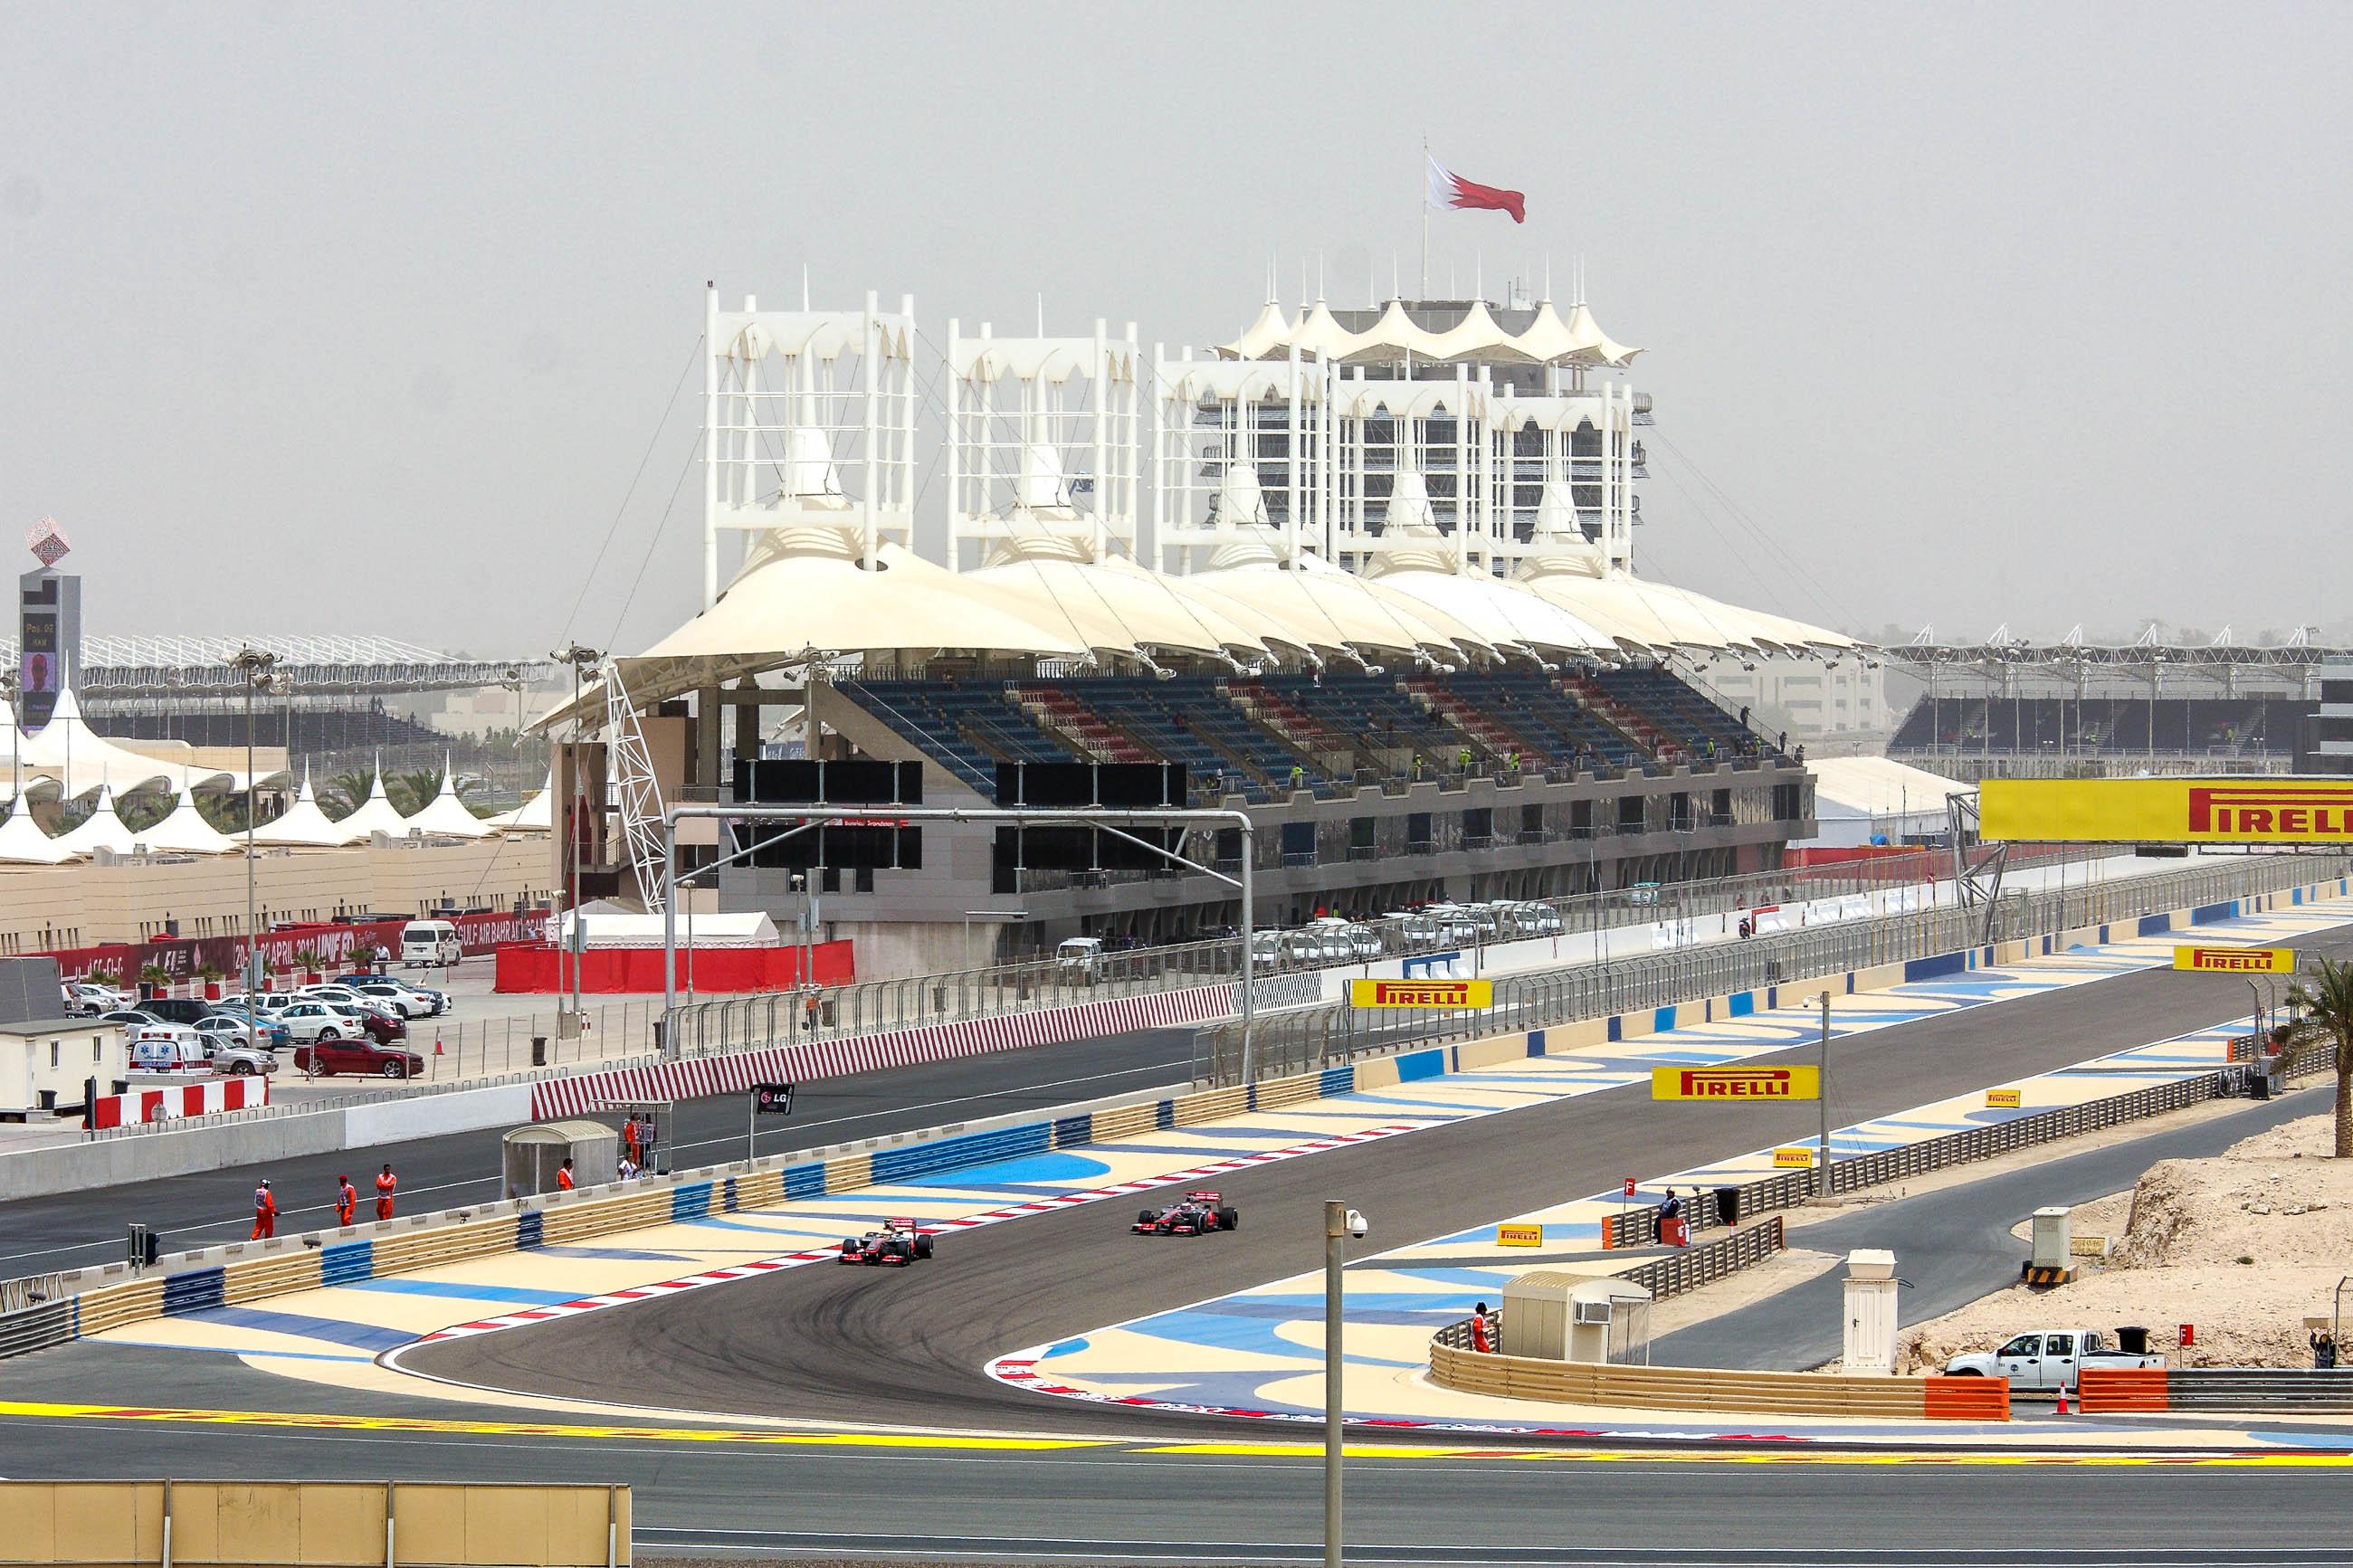 formel 1 in bahrain ferrari dominiert das freie training. Black Bedroom Furniture Sets. Home Design Ideas